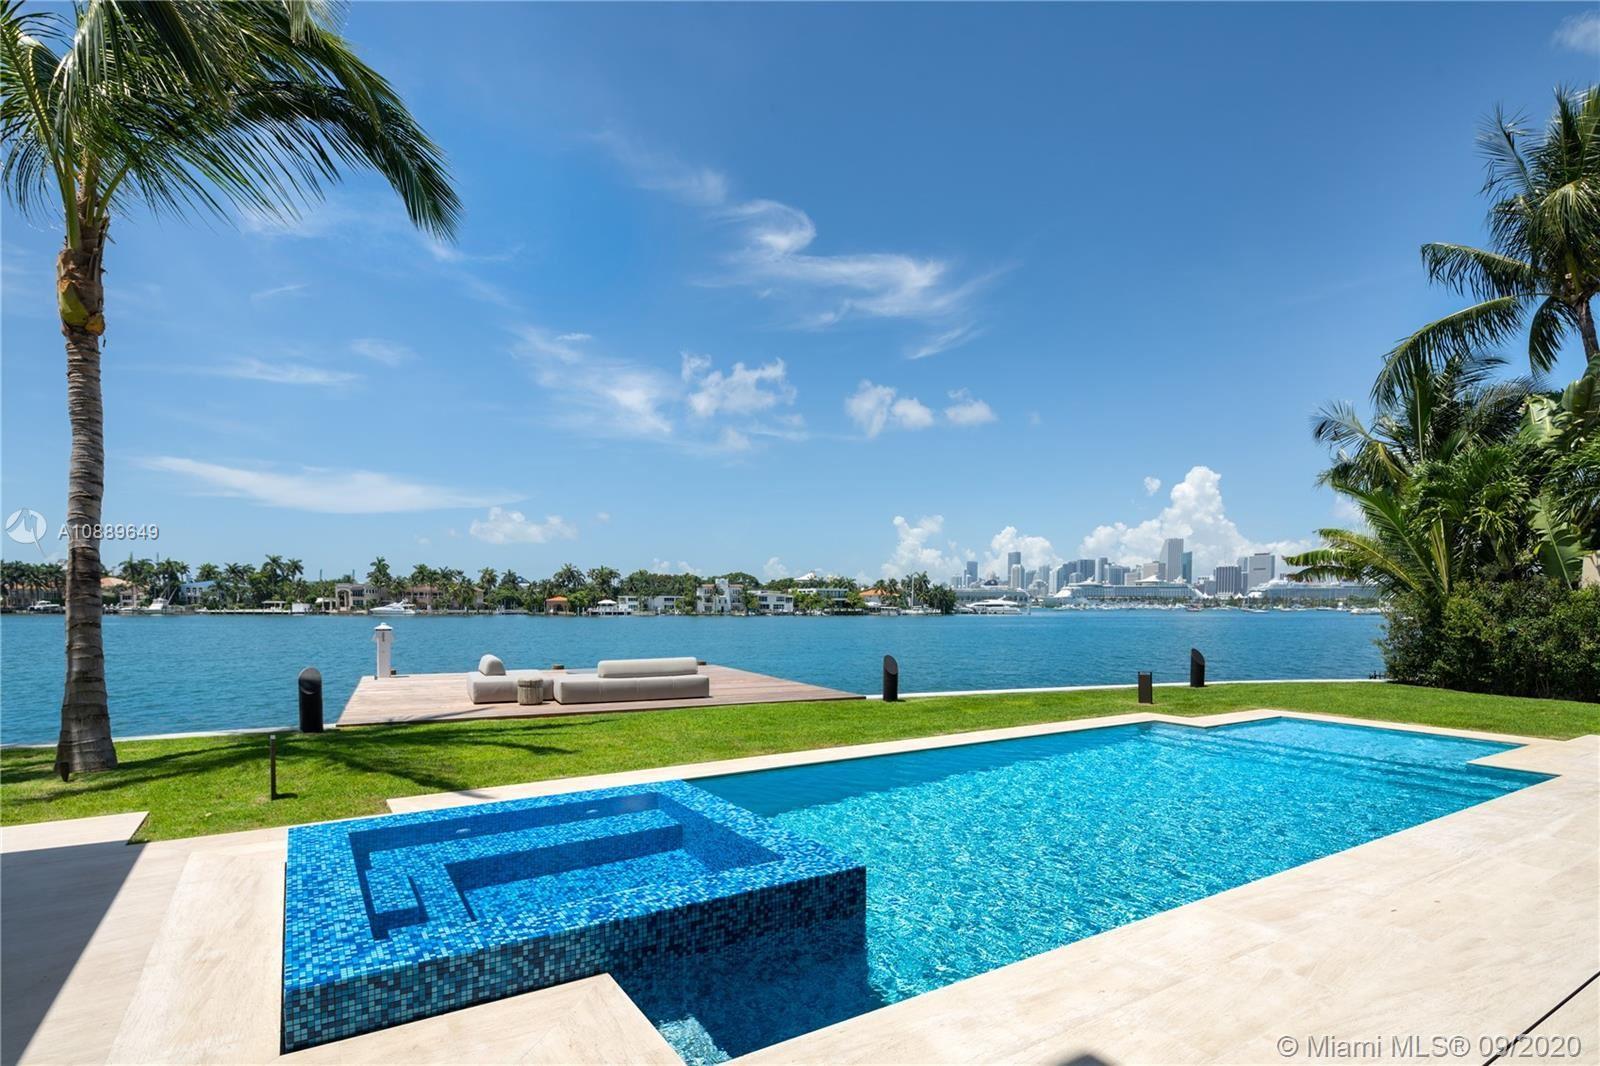 Photo 29 of Listing MLS a10889649 in 10 W San Marino Dr Miami Beach FL 33139